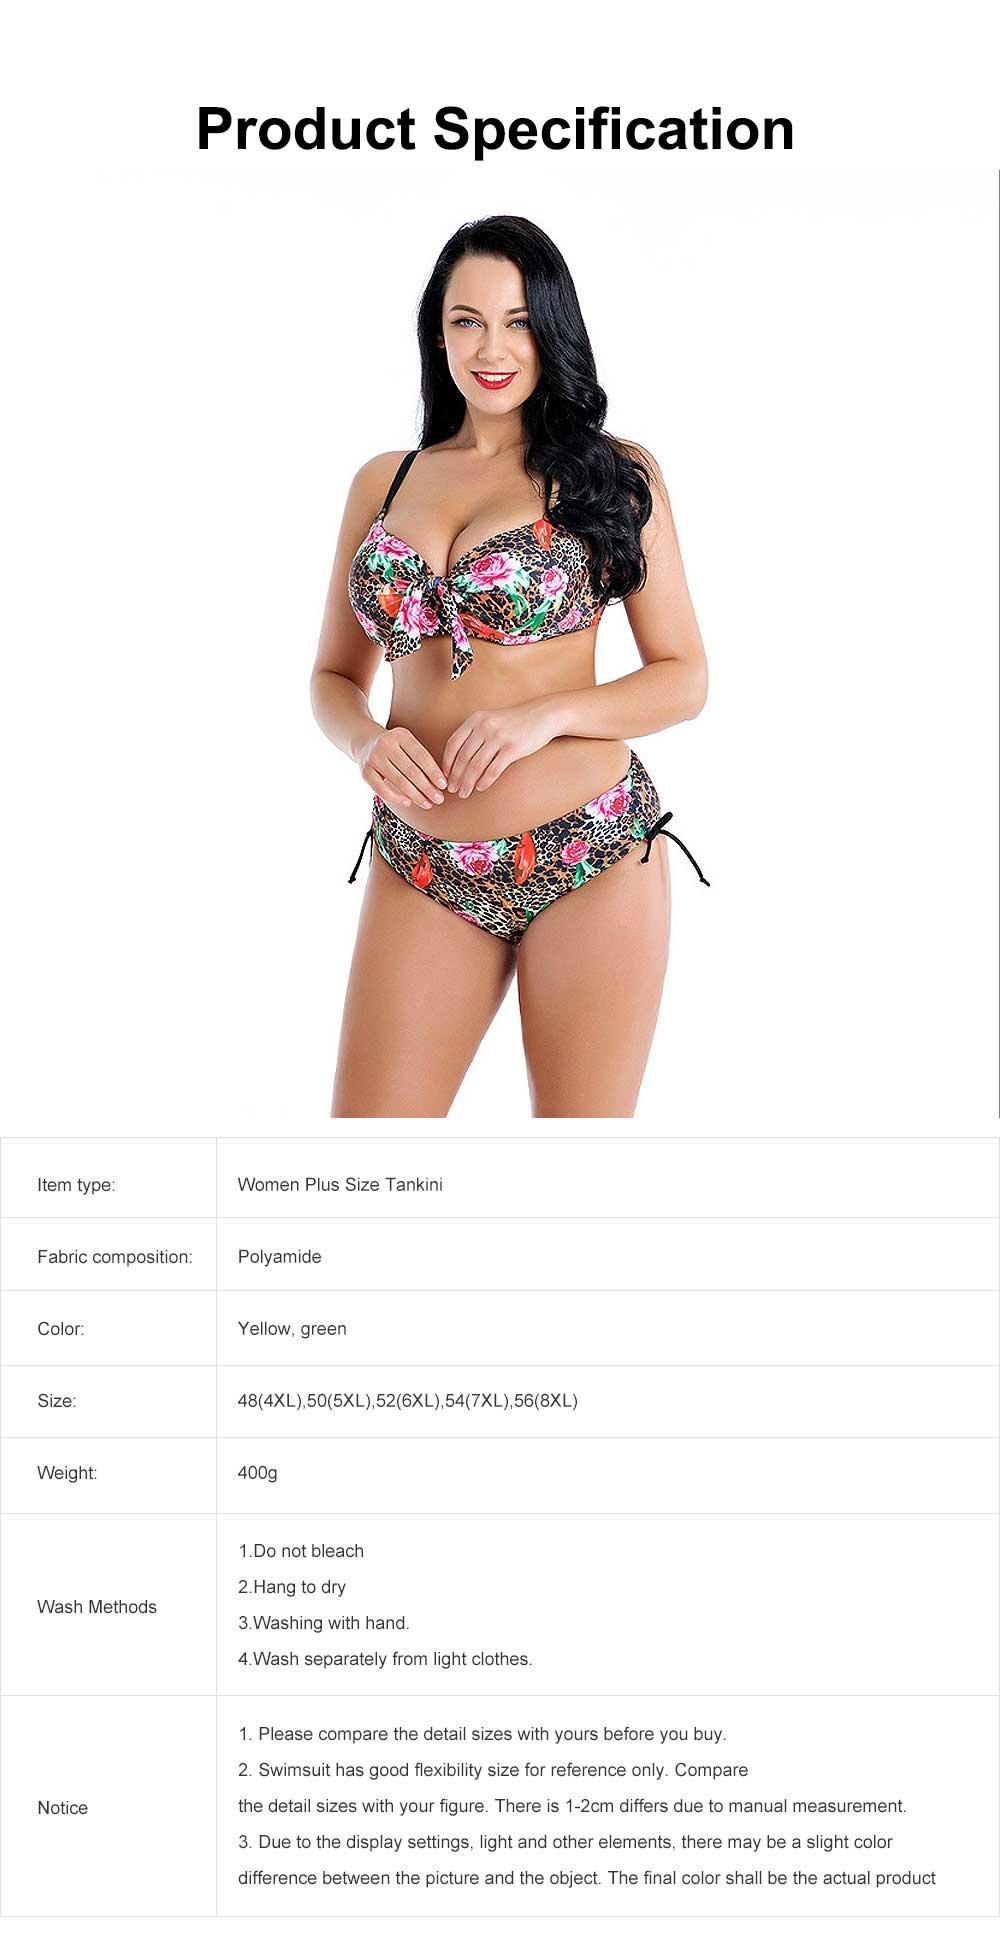 2019 Women's Plus Size Tankini Falsies Bikini with Steel Bracket, Fashion Printed Sexy Bikini, Large Size Two Pieces Swimsuit for Girls 5